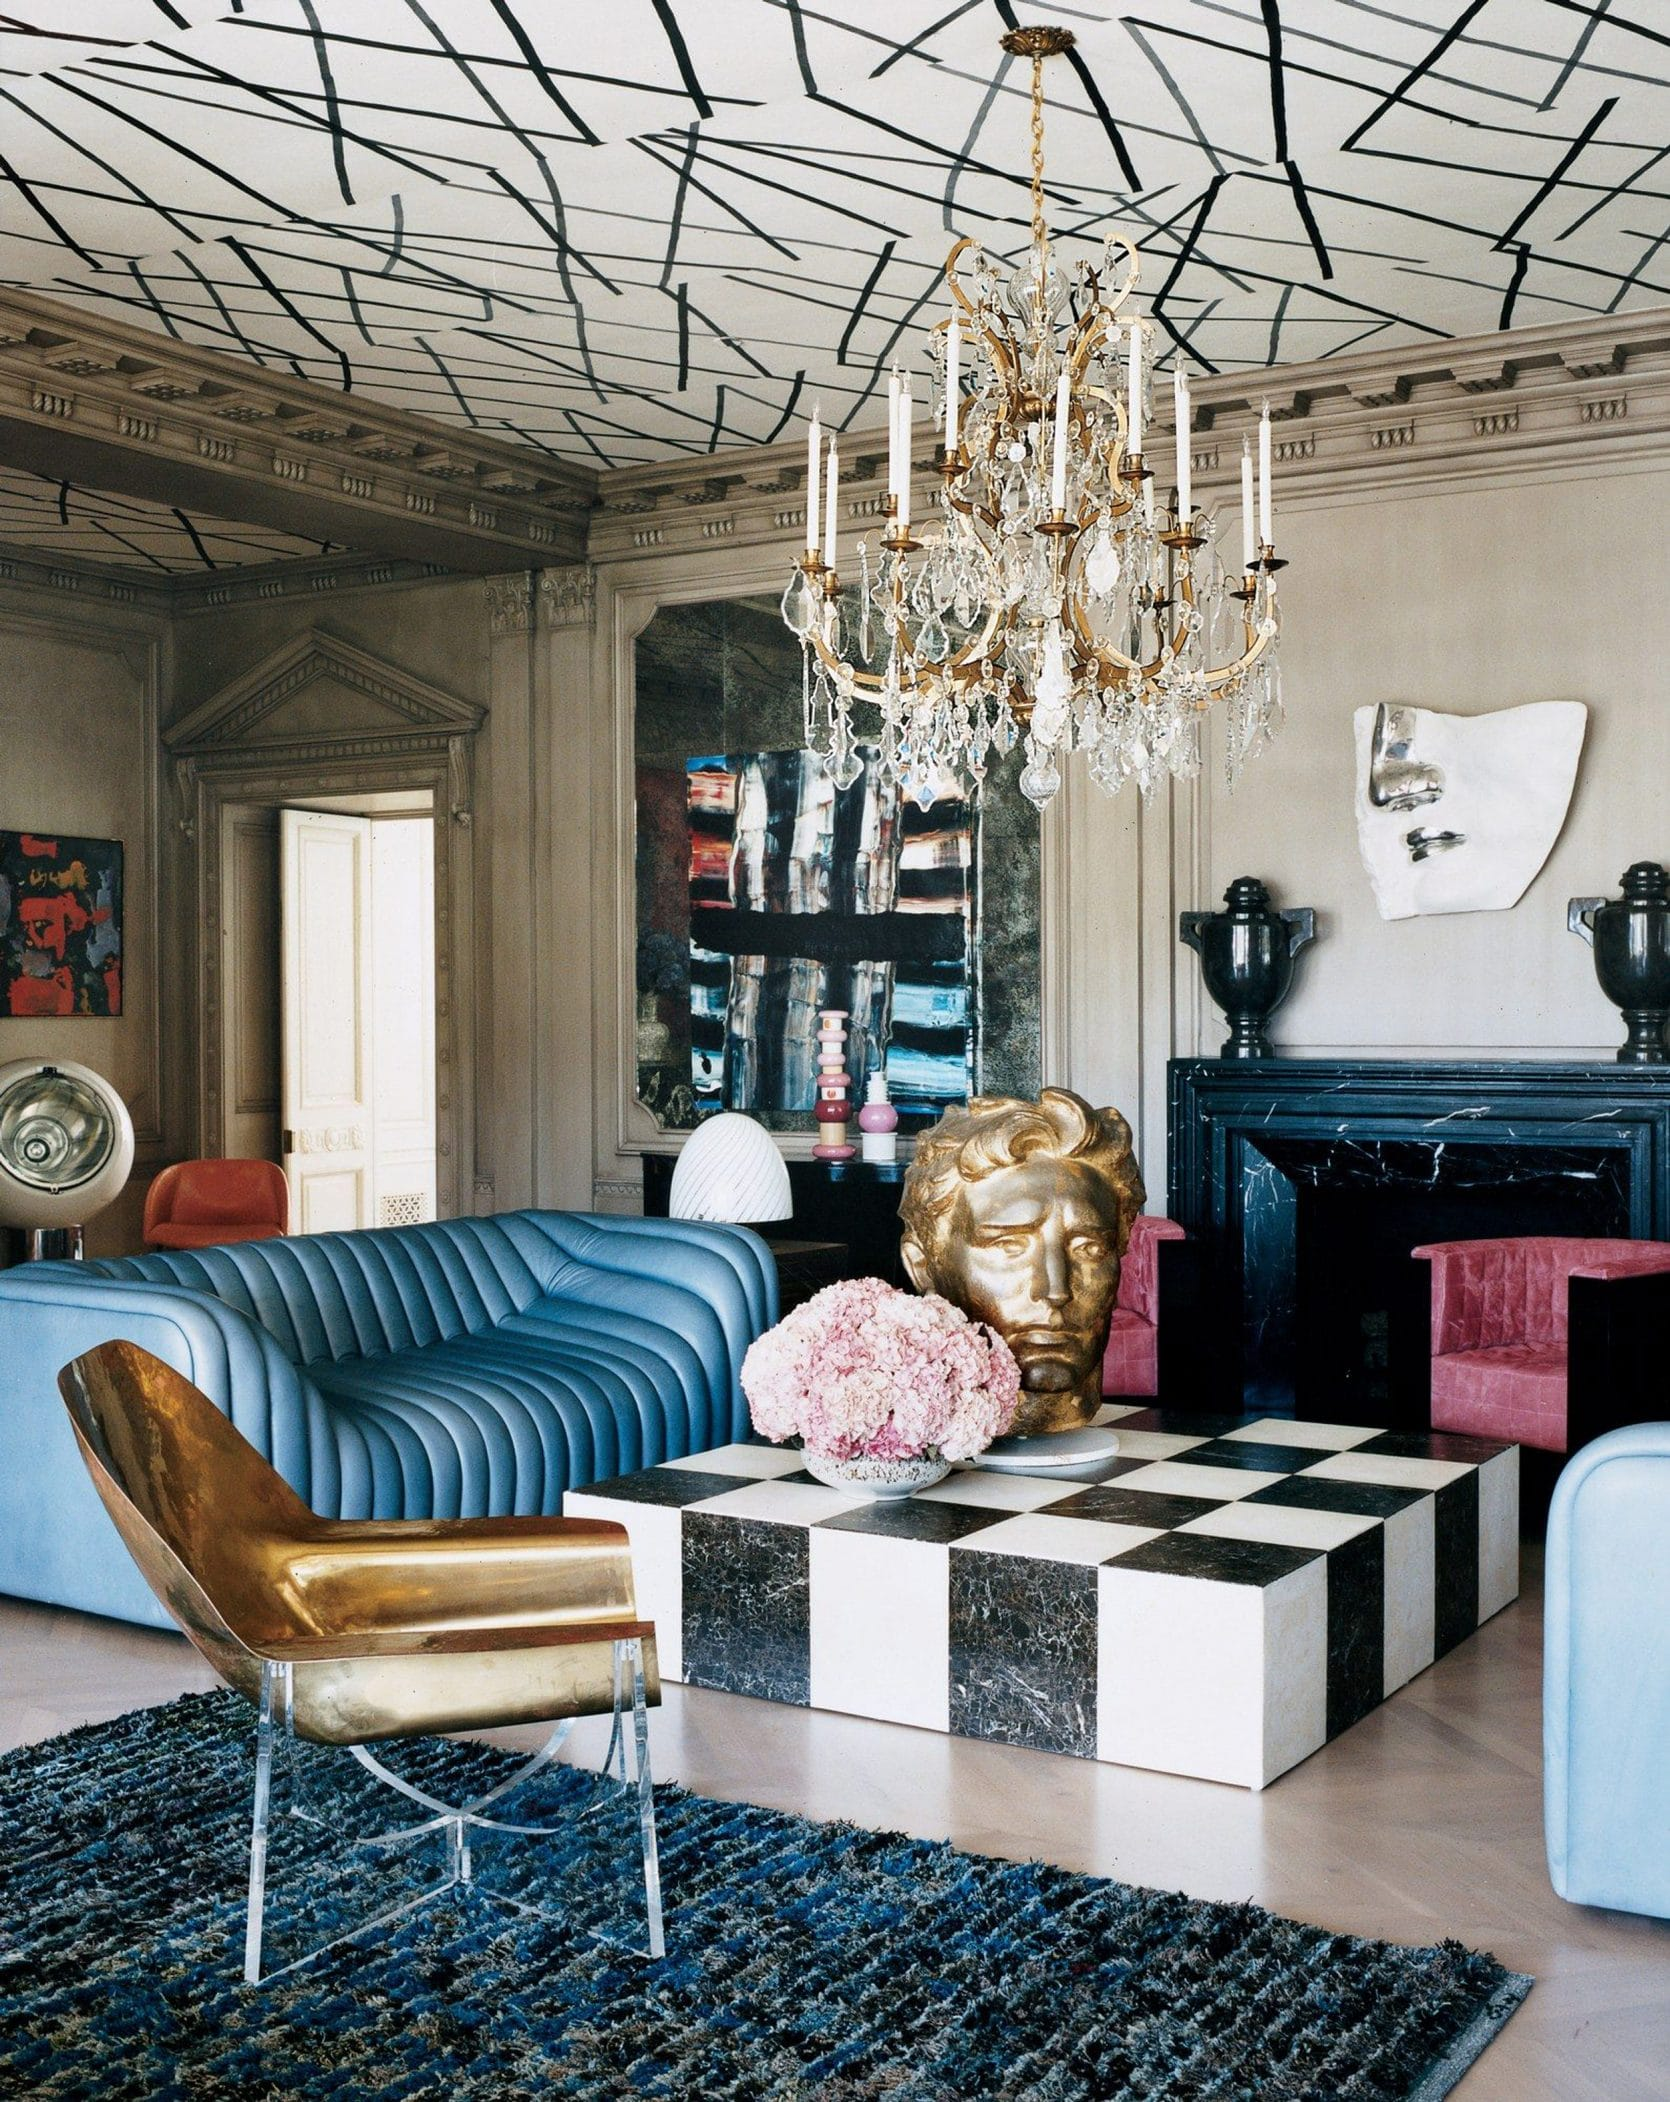 New postmodern - 80s interior design trends